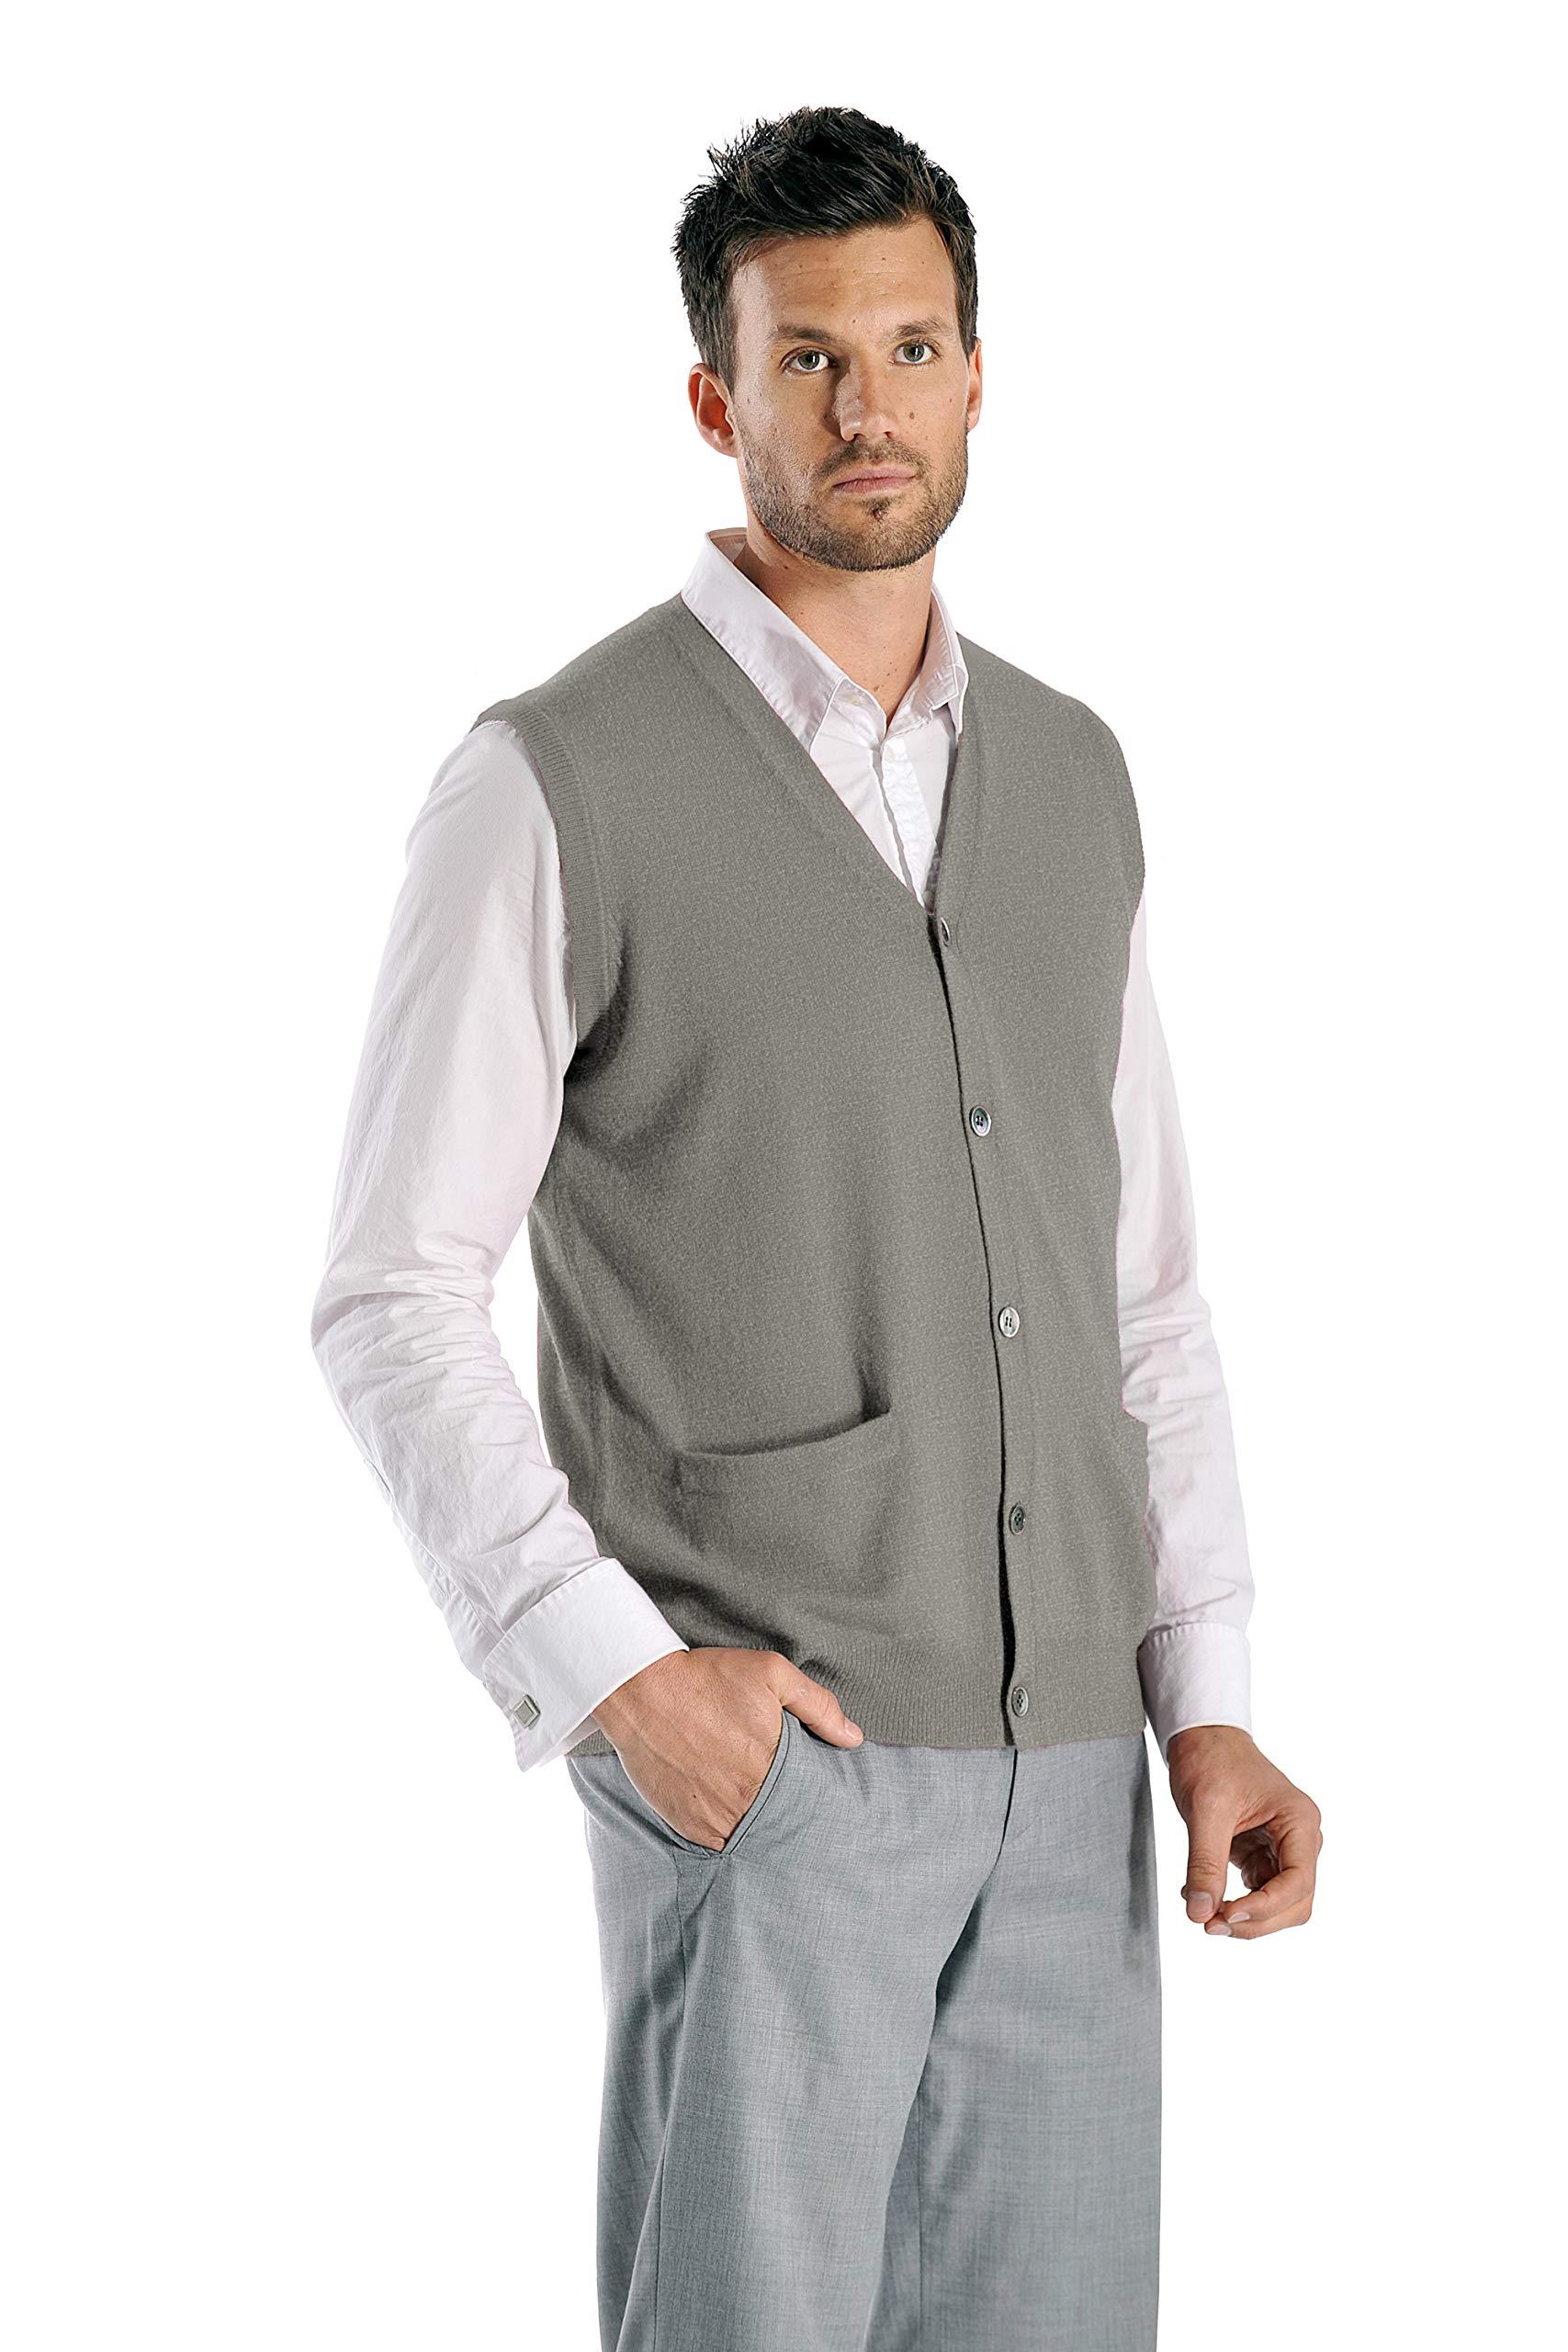 Cashmere Boutique: Men's 100% Pure Cashmere Sleeveless Cardigan Vest Sweater (Color: Medium Gray, Size: Medium) by Cashmere Boutique